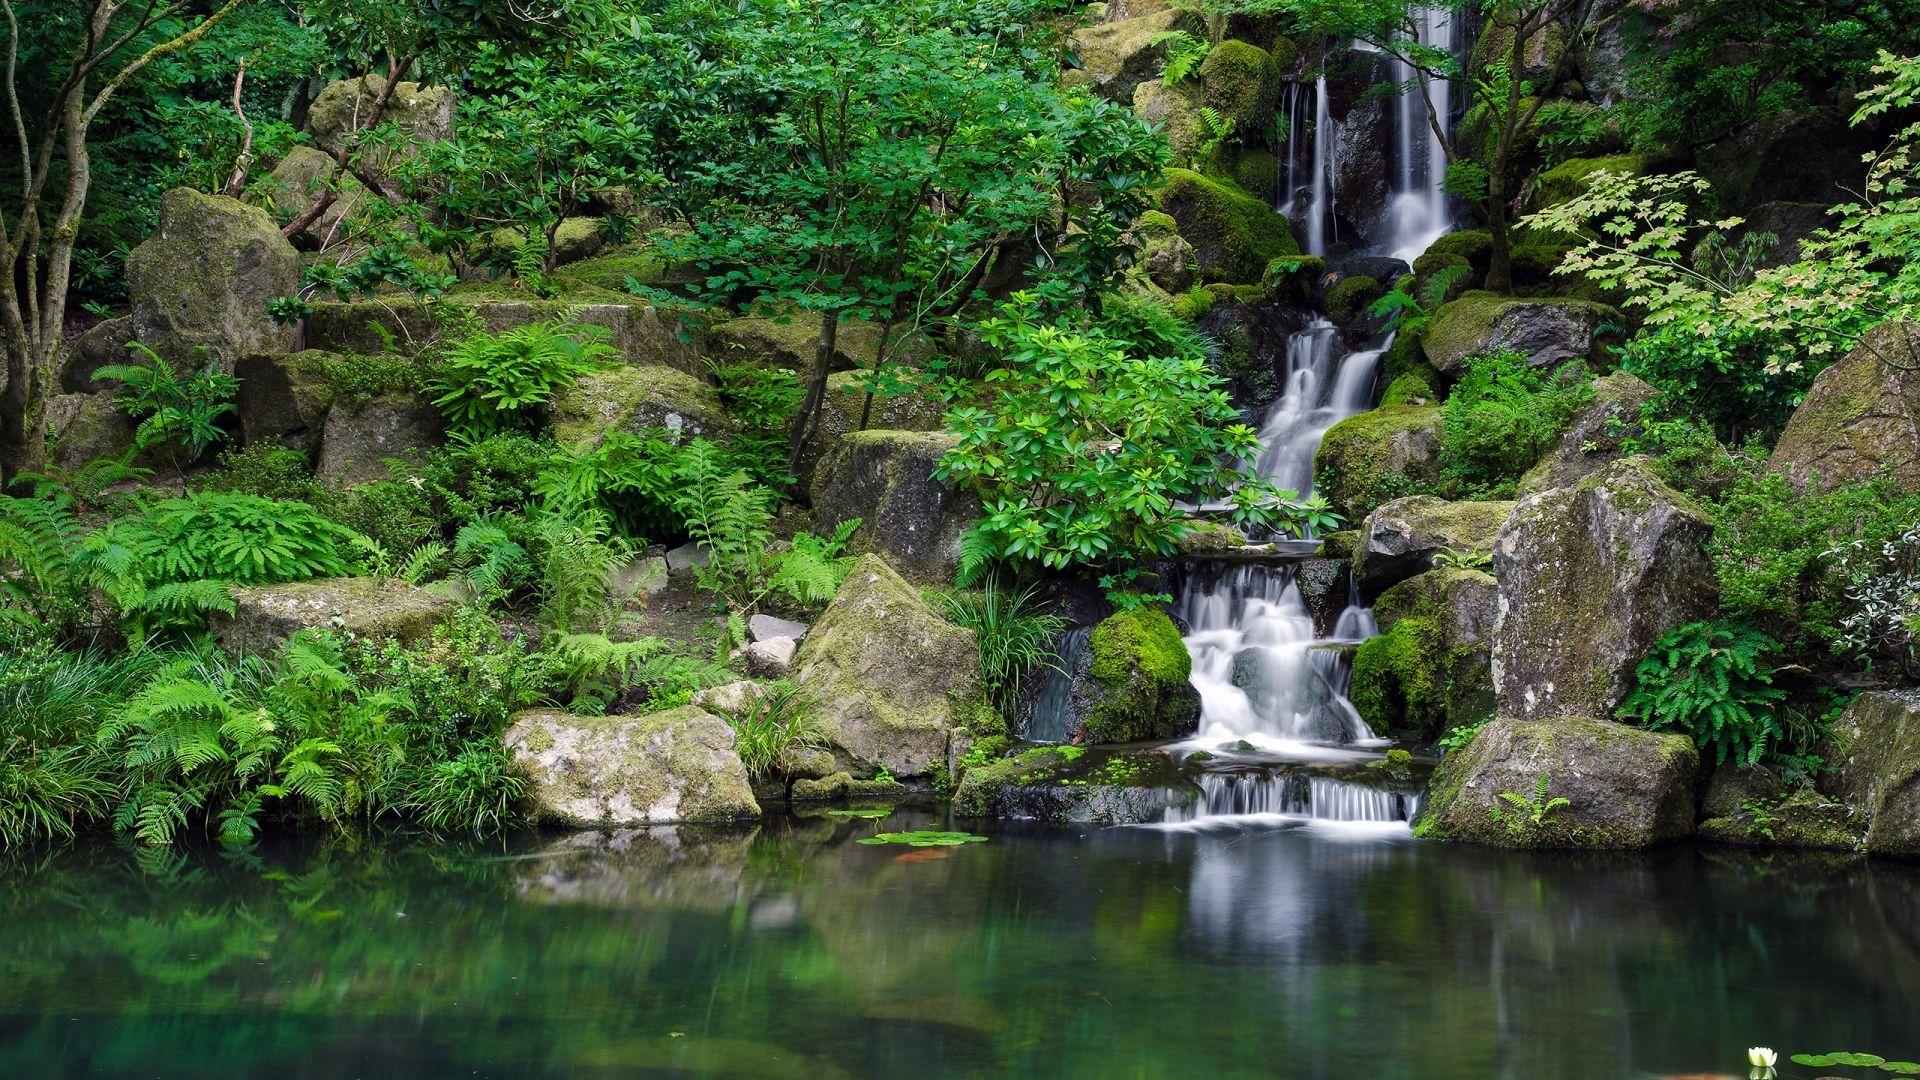 Download Wallpaper 1920x1080 Waterfall River Grass Herbs Full Hd 1080p Hd Background Forest Waterfall Waterfall Wallpaper Portland Japanese Garden